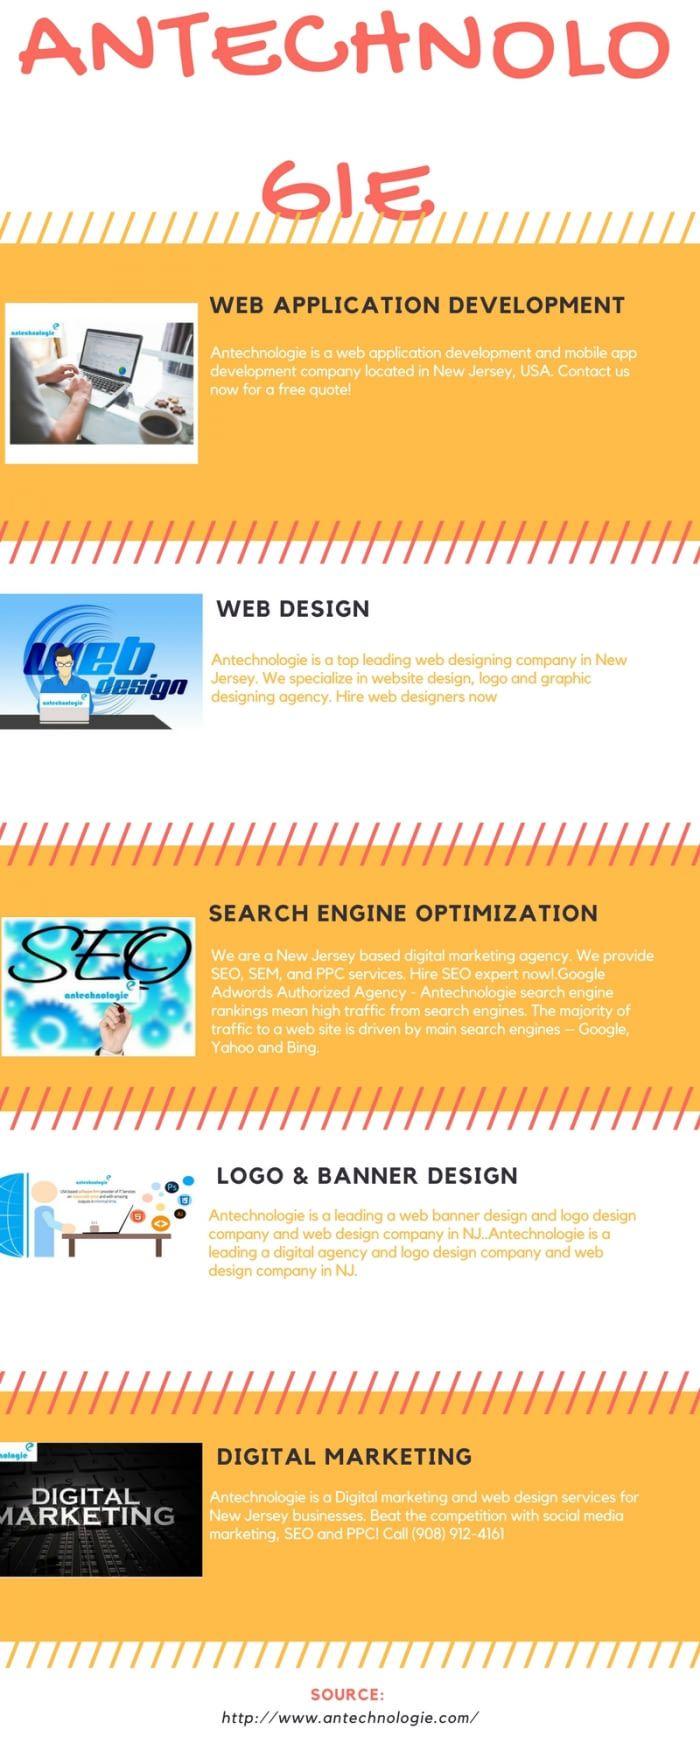 Integrated Web Agency For Design And Marketing Edison Antechnologie App Development Process Small Business Website Design Web Development Company